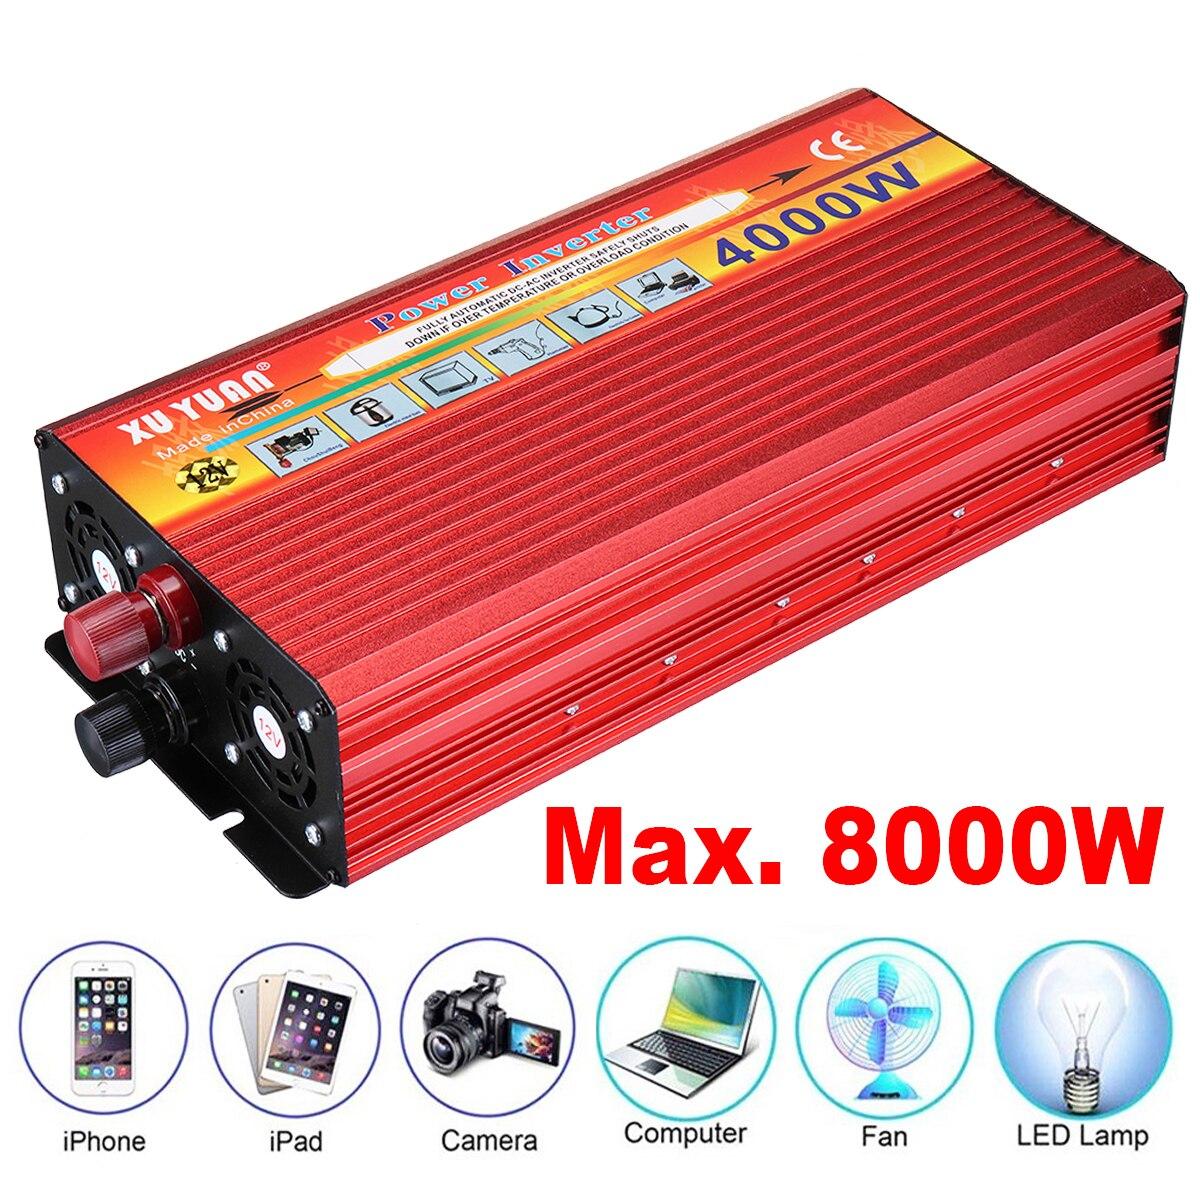 4000W Inverter Converter Portable Aotomatic Max Power Switch Sine Wave Car Charger DC 12V To110V 240V AC USB Vehicle Transformer